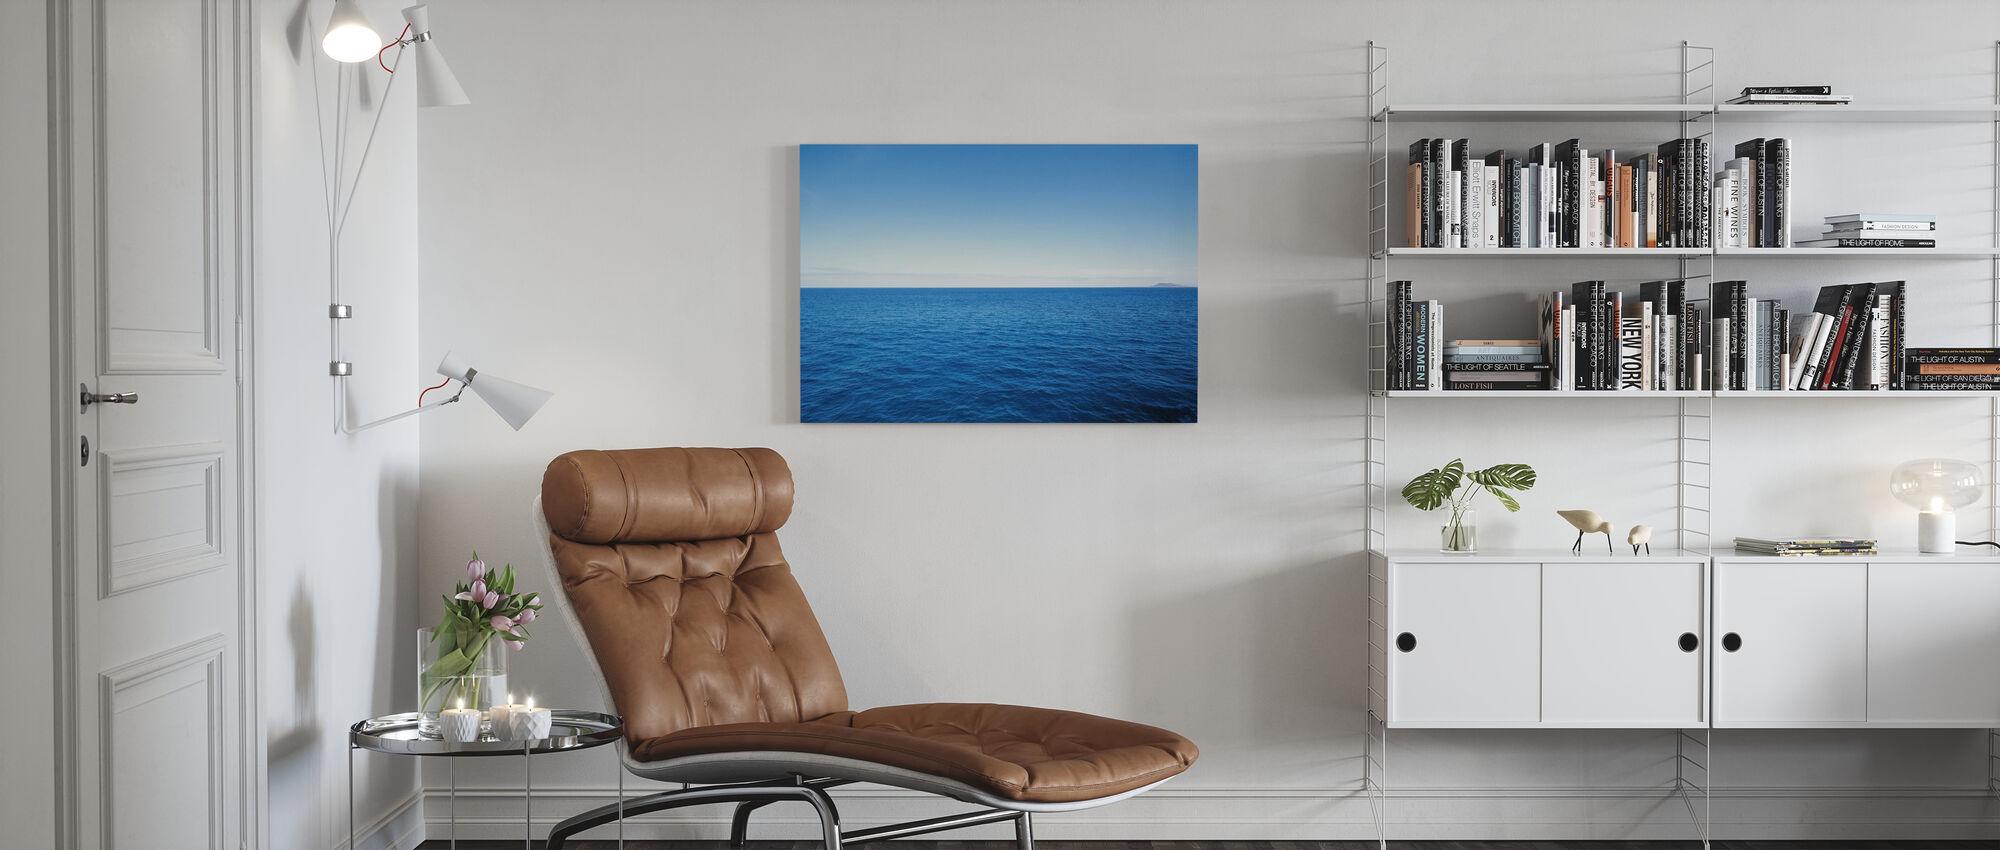 The Big Blue - Canvas print - Living Room